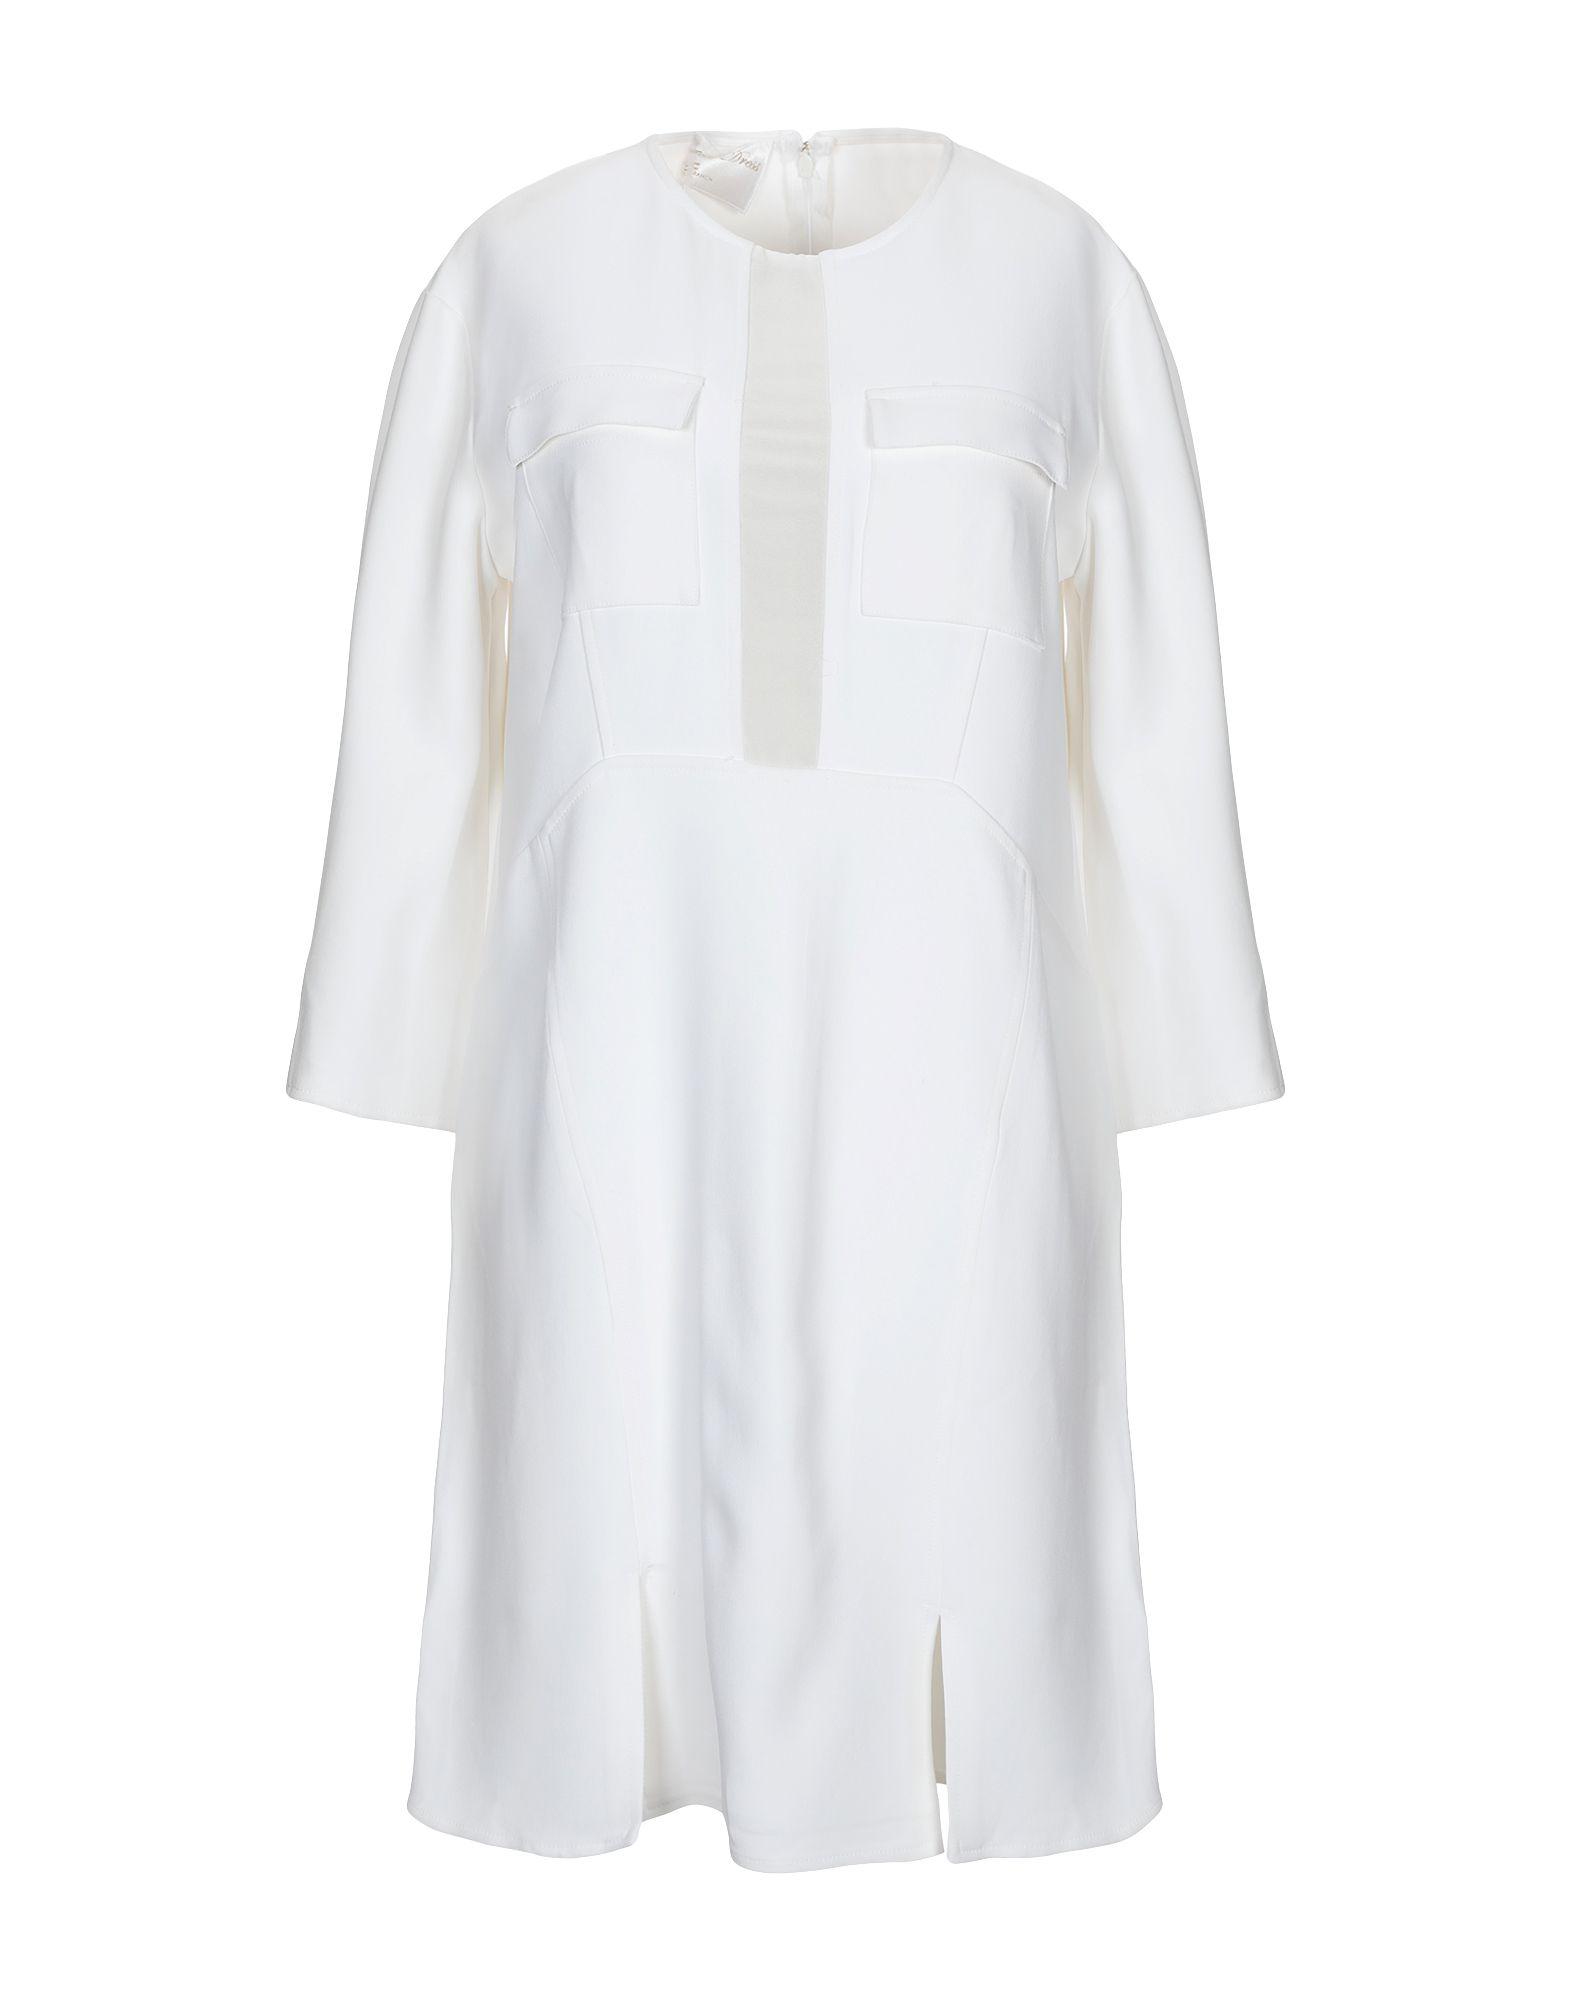 PASSEPARTOUT DRESS by ELISABETTA FRANCHI CELYN b. Короткое платье платье quelle b c best connections by heine 38034